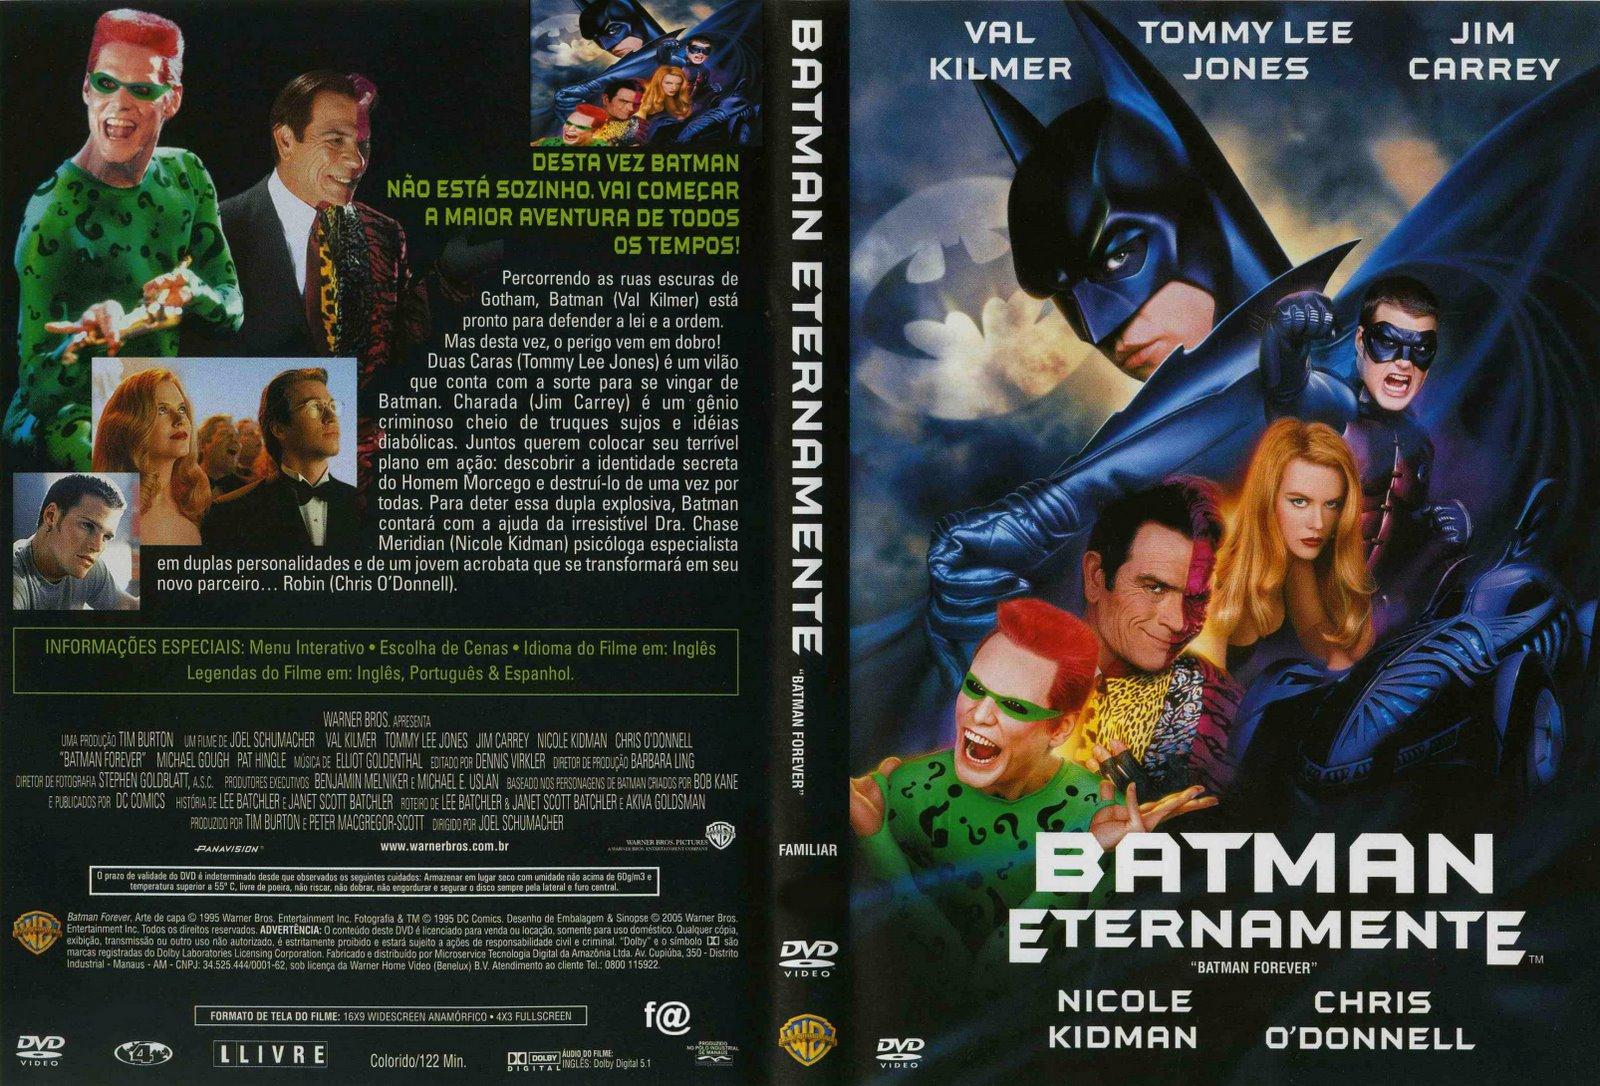 http://2.bp.blogspot.com/_Tgeb_LTYc0o/TH0F4TE1TVI/AAAAAAAAAw4/Wh_SjrNEjeQ/s1600/Batman+Eternamente.jpg